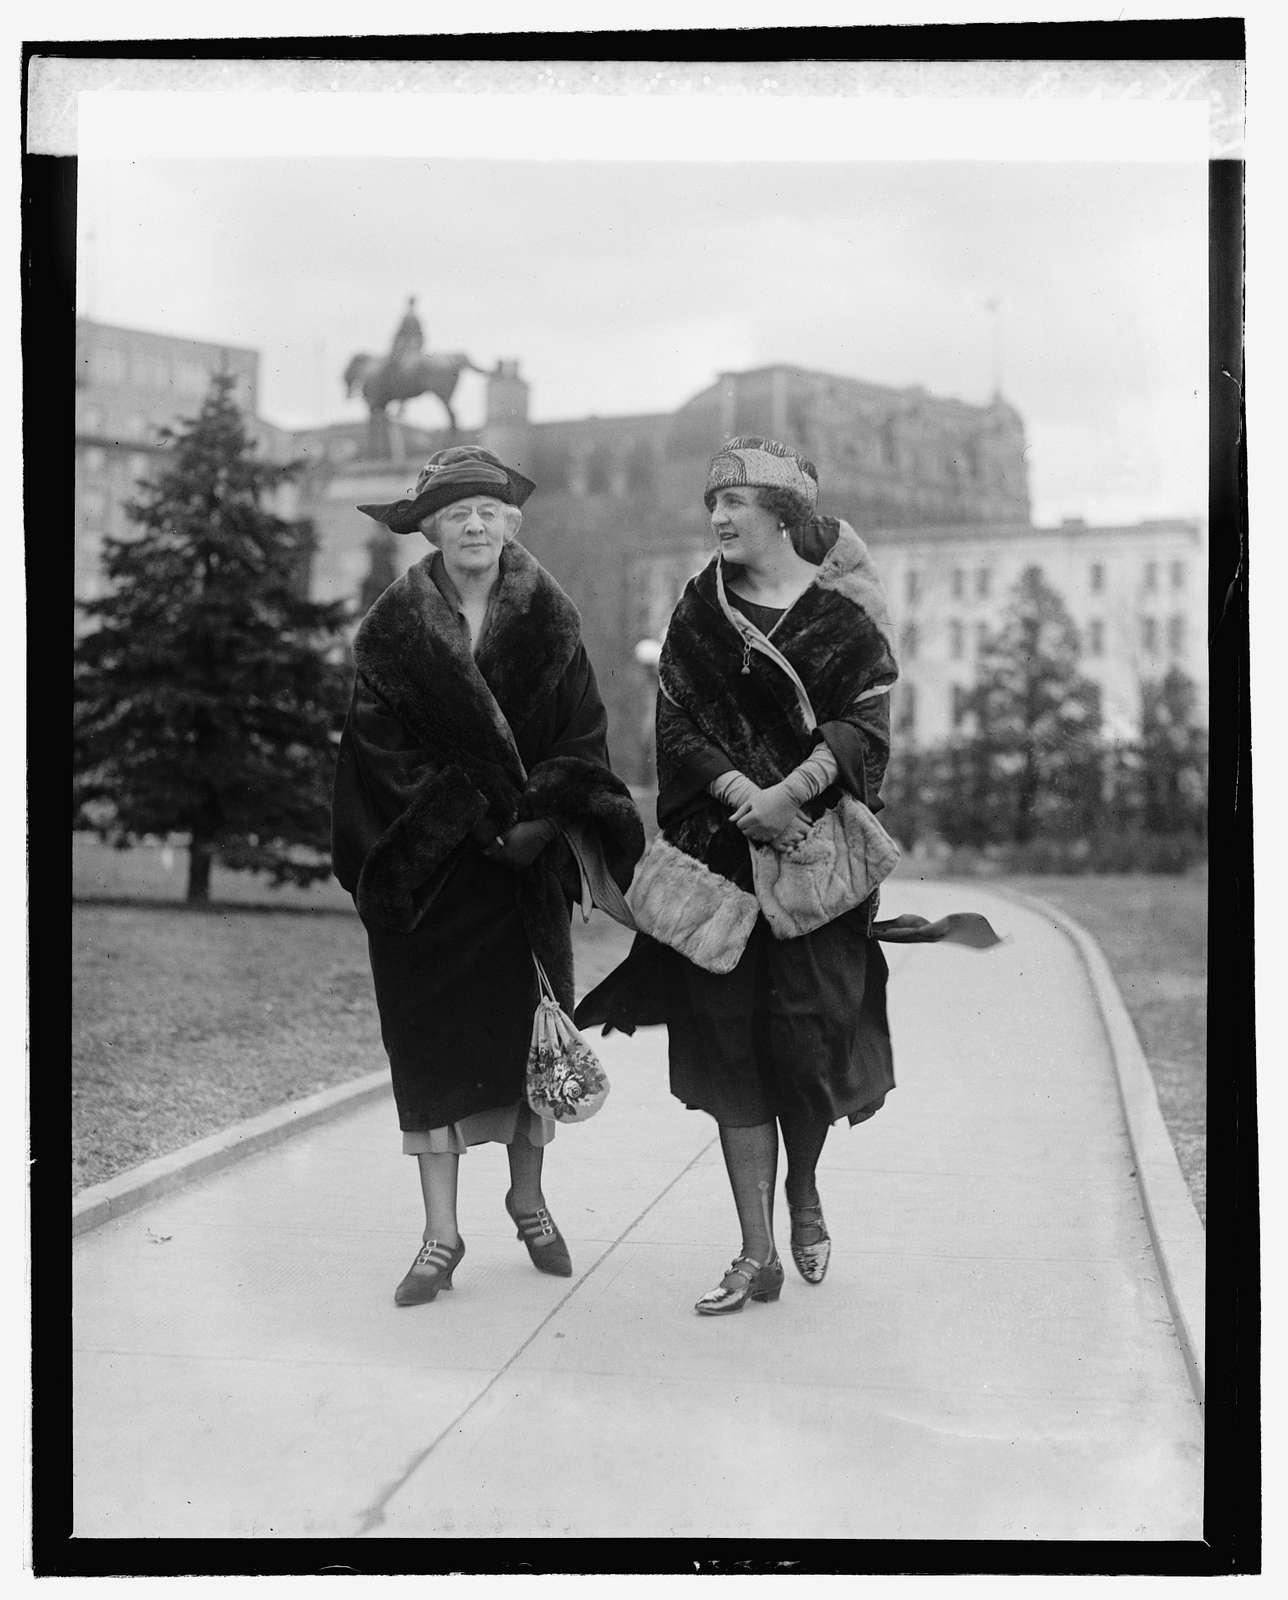 Mrs. W.M. Calder, Miss Marian Calder, 22322